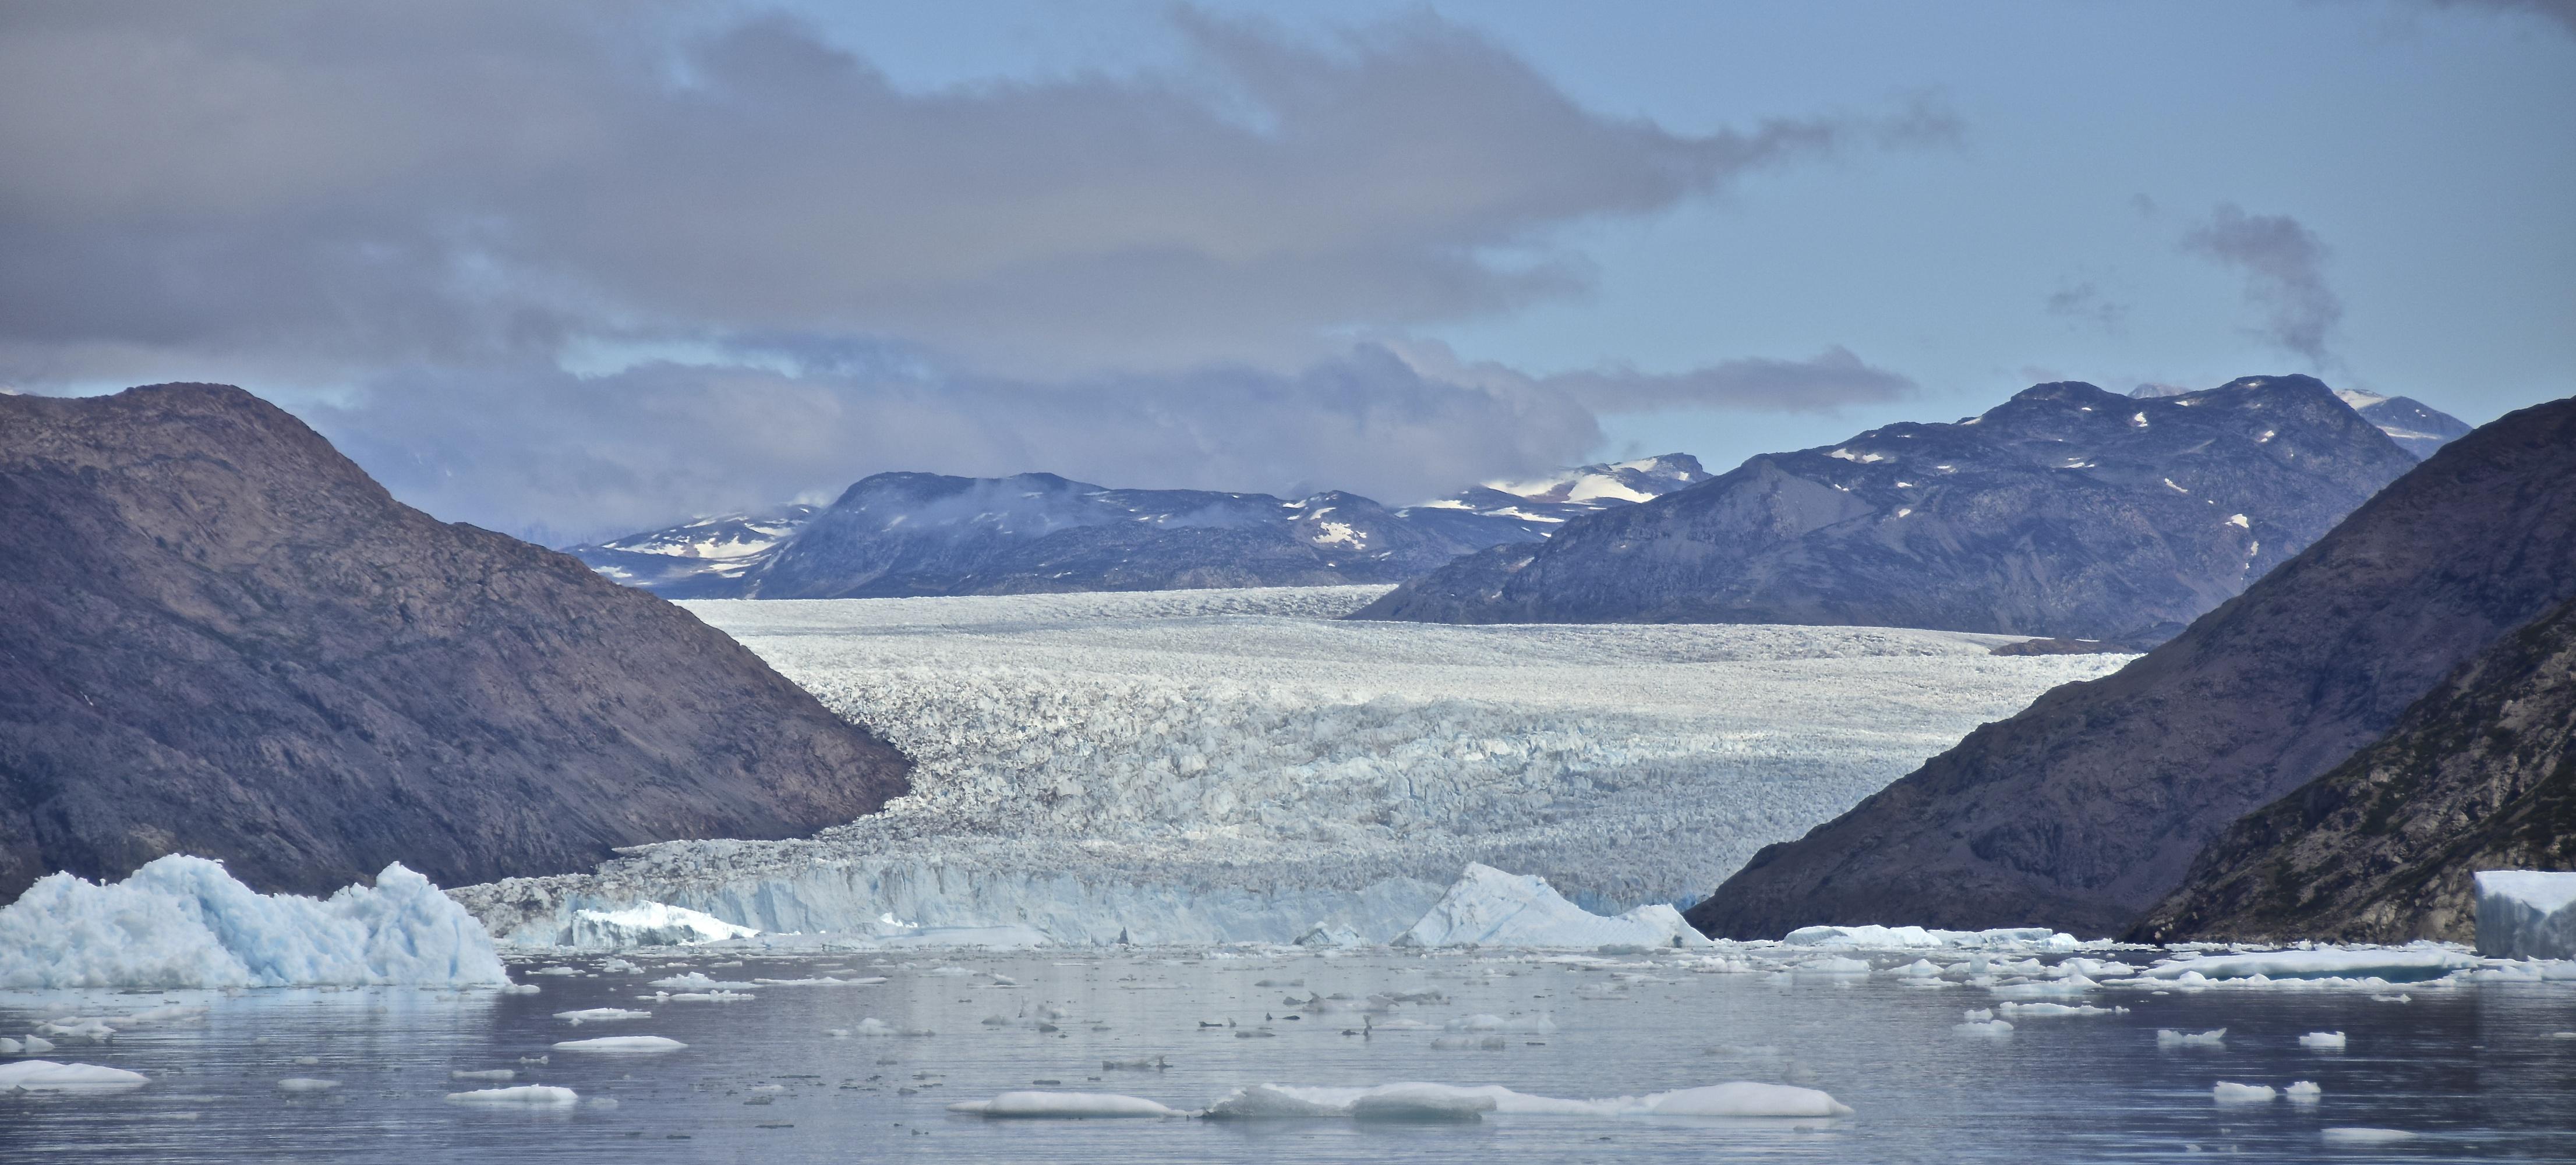 Narsarsuaq - South Greenland